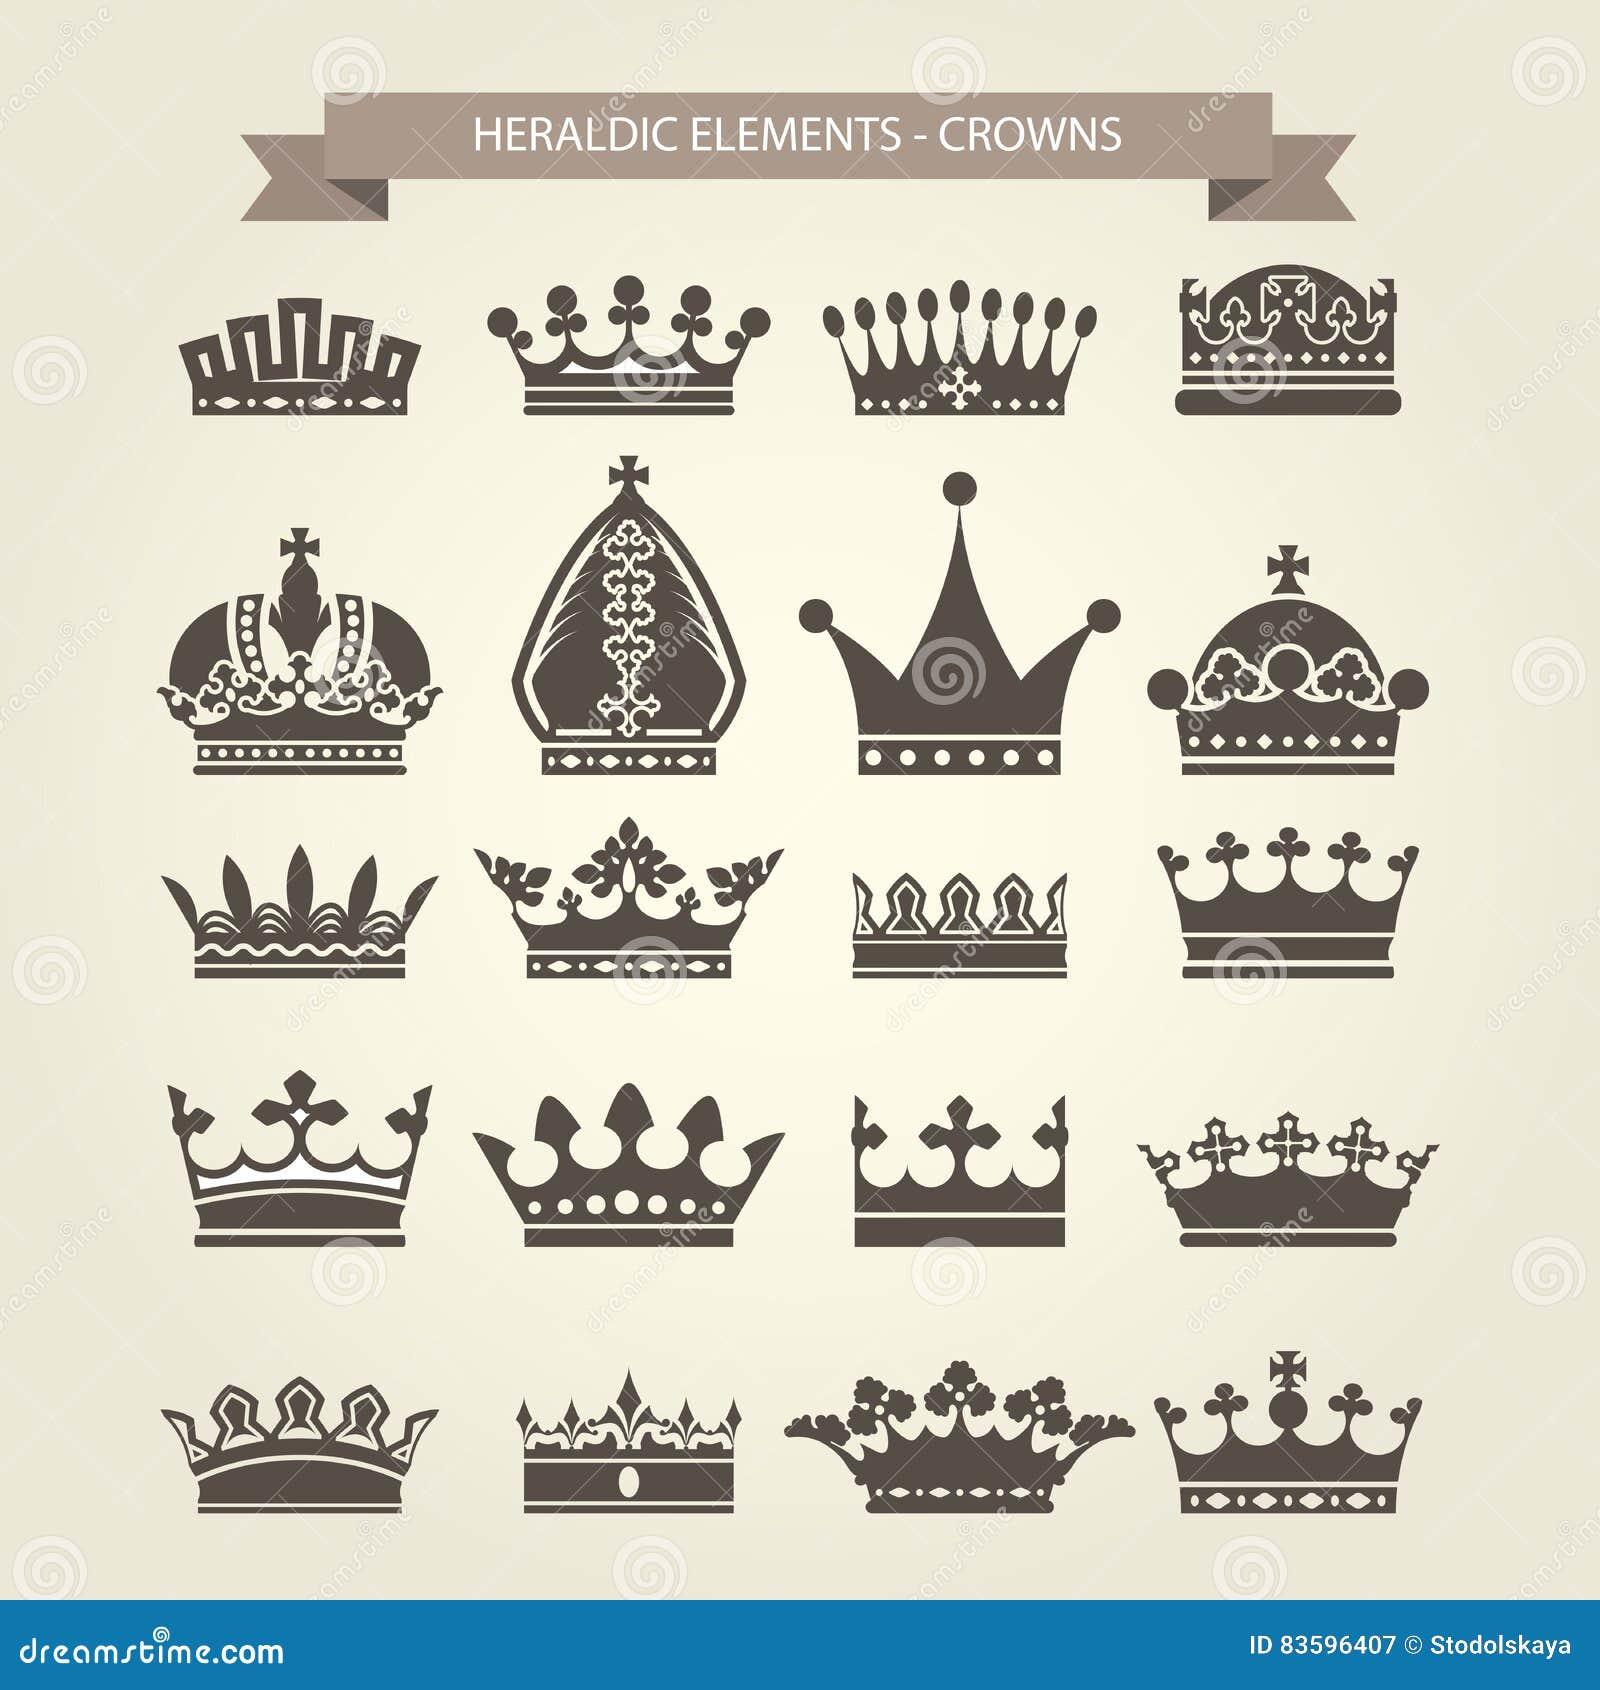 Smbolos herldicos da autoridade ilustrao do vetor ilustrao smbolos herldicos coroas reais ajustadas fotografia de stock royalty free ccuart Images